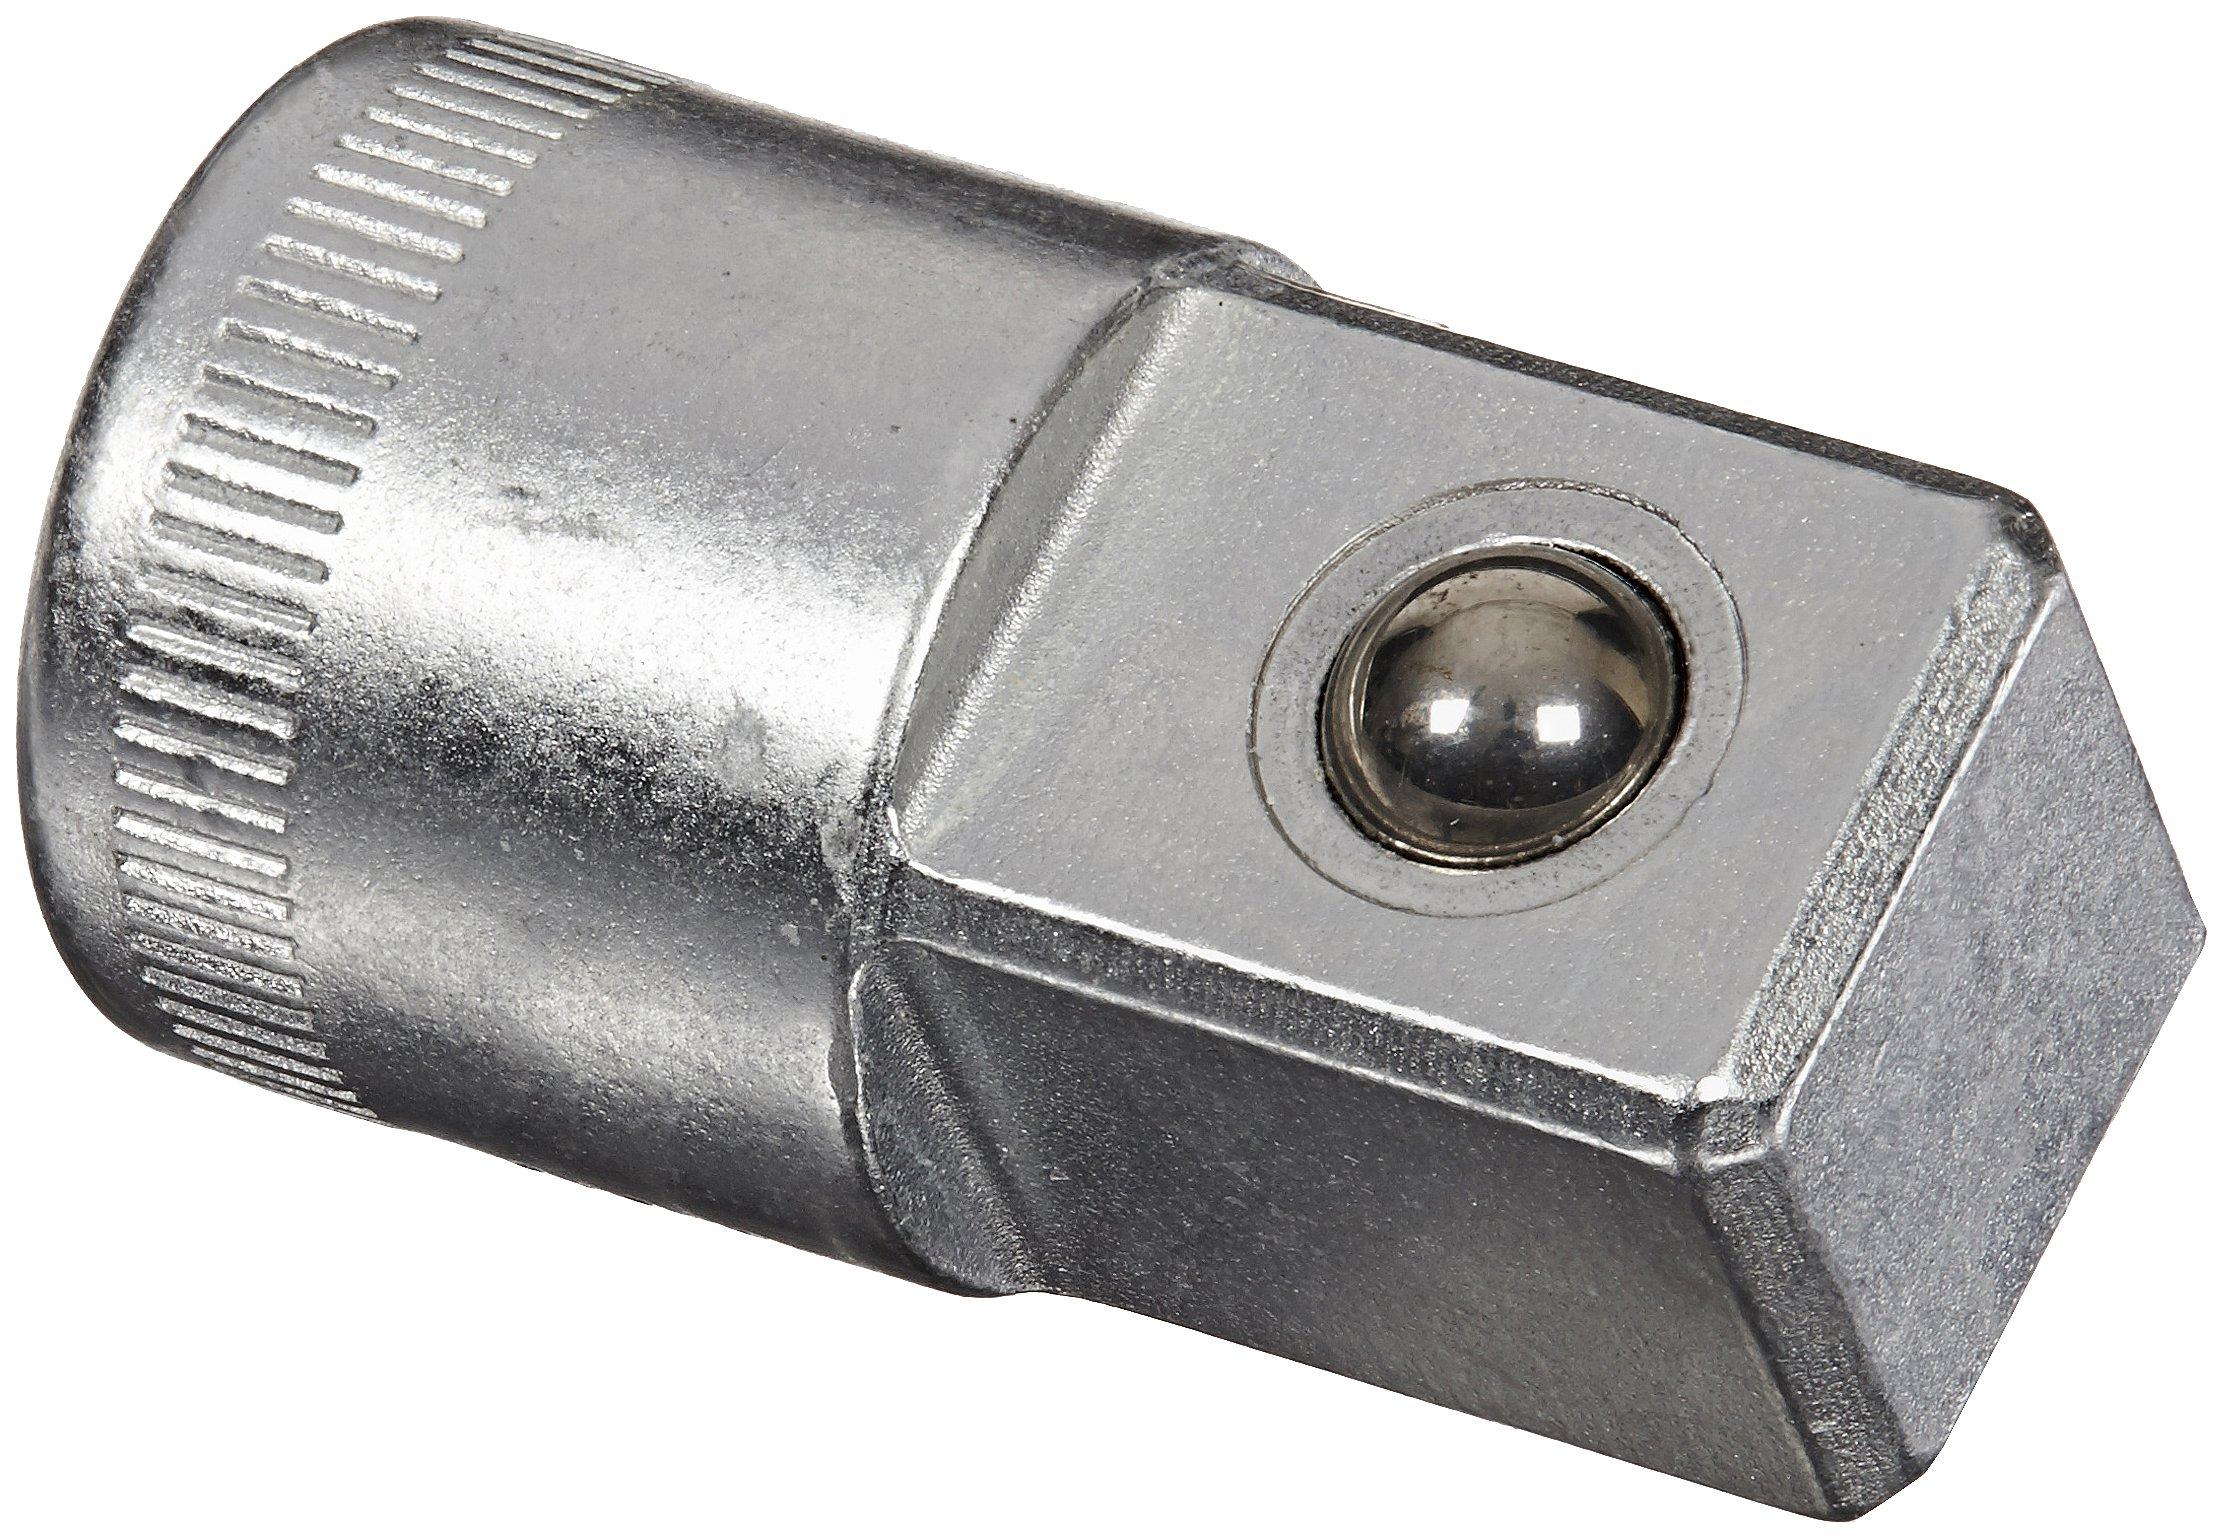 Stahlwille 432 Steel Adaptor, 3/8'' Socket x 1/2'' Plug, 17.2mm Diameter, 31mm Length